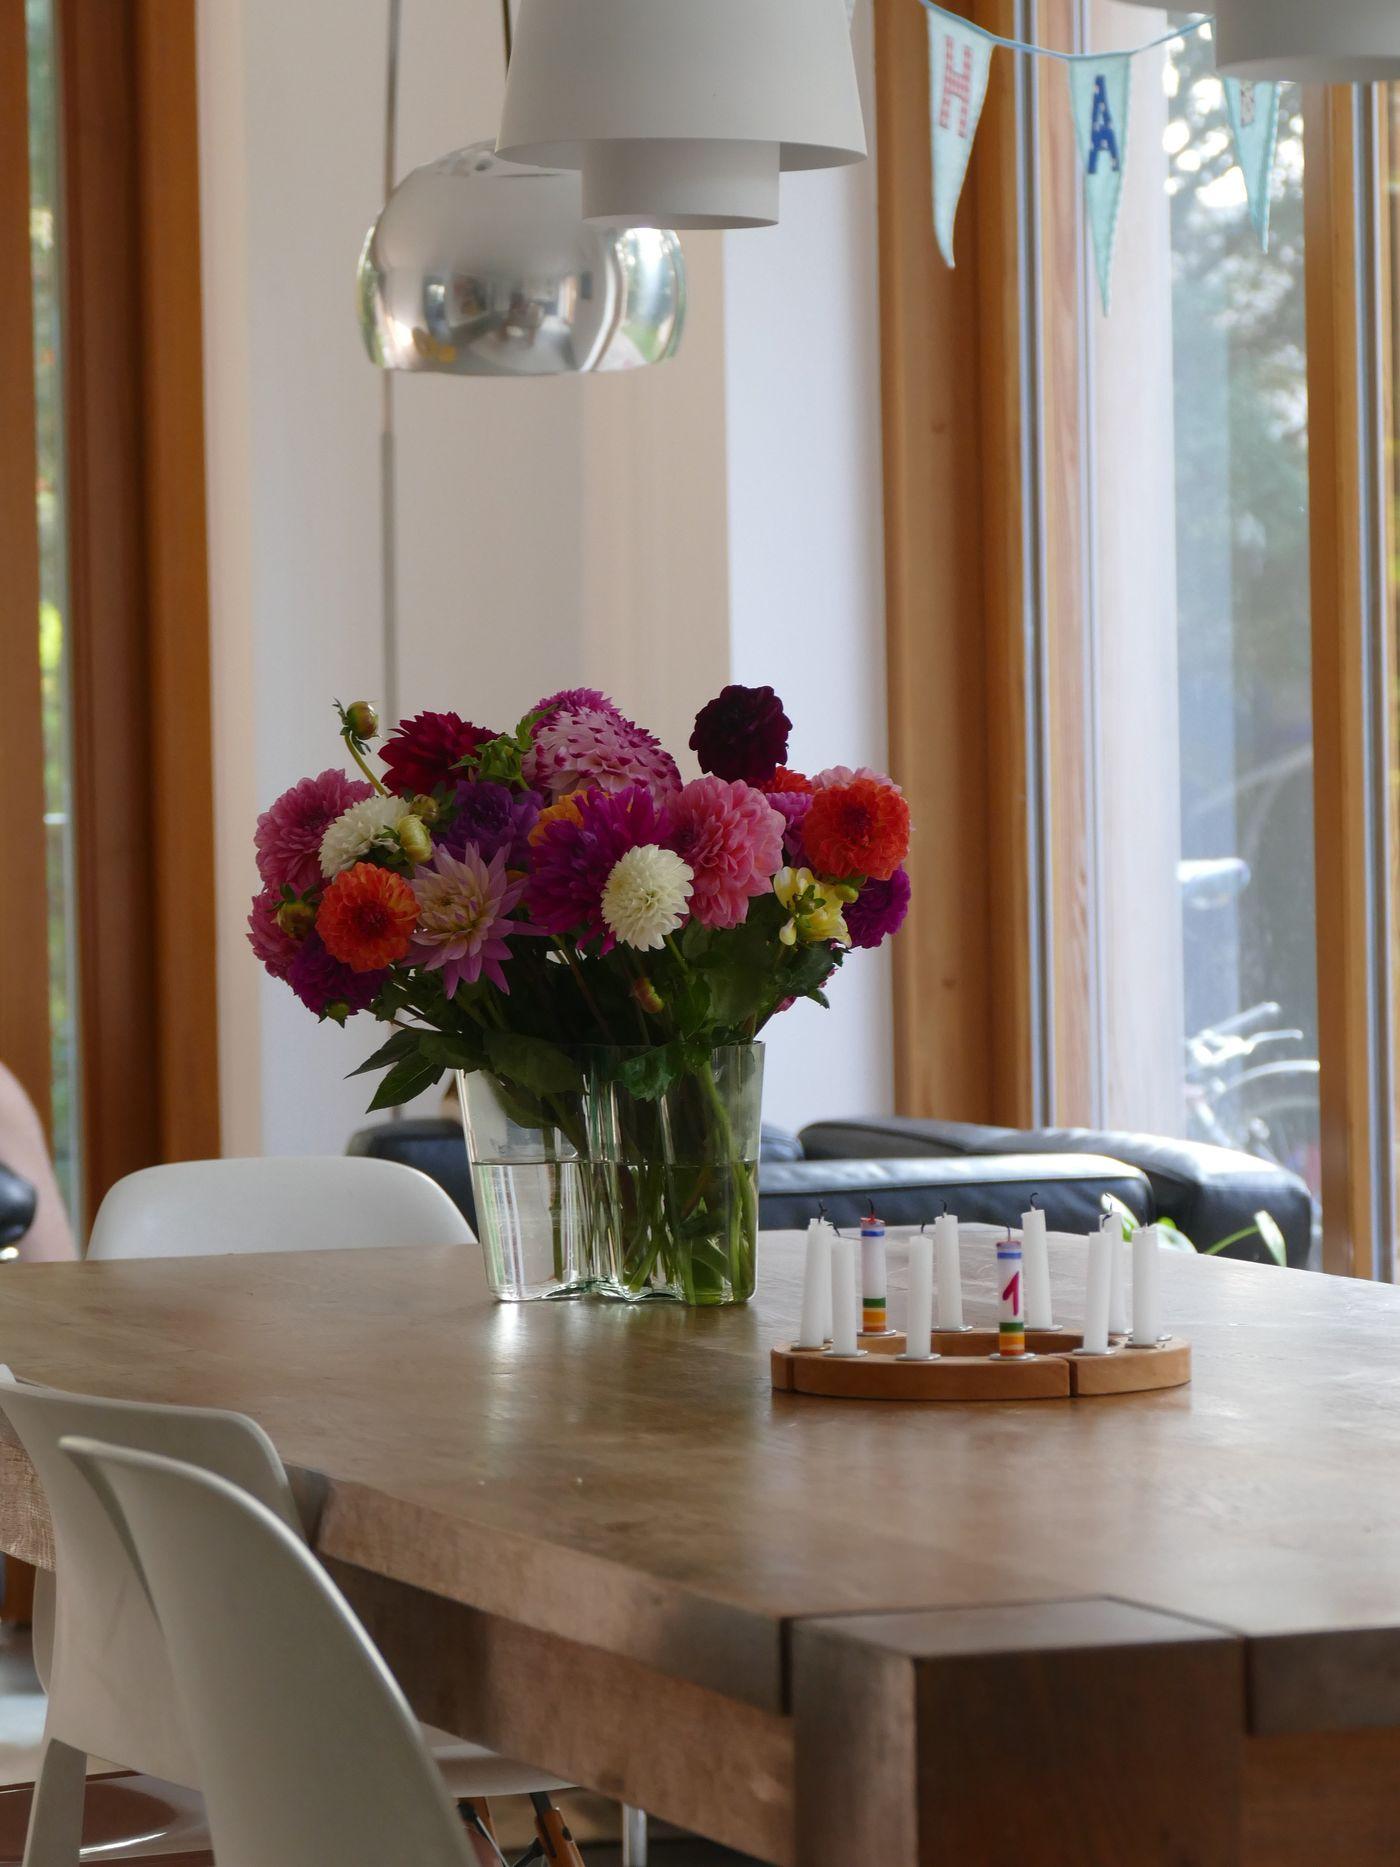 alvar aalto und die aalto vase. Black Bedroom Furniture Sets. Home Design Ideas